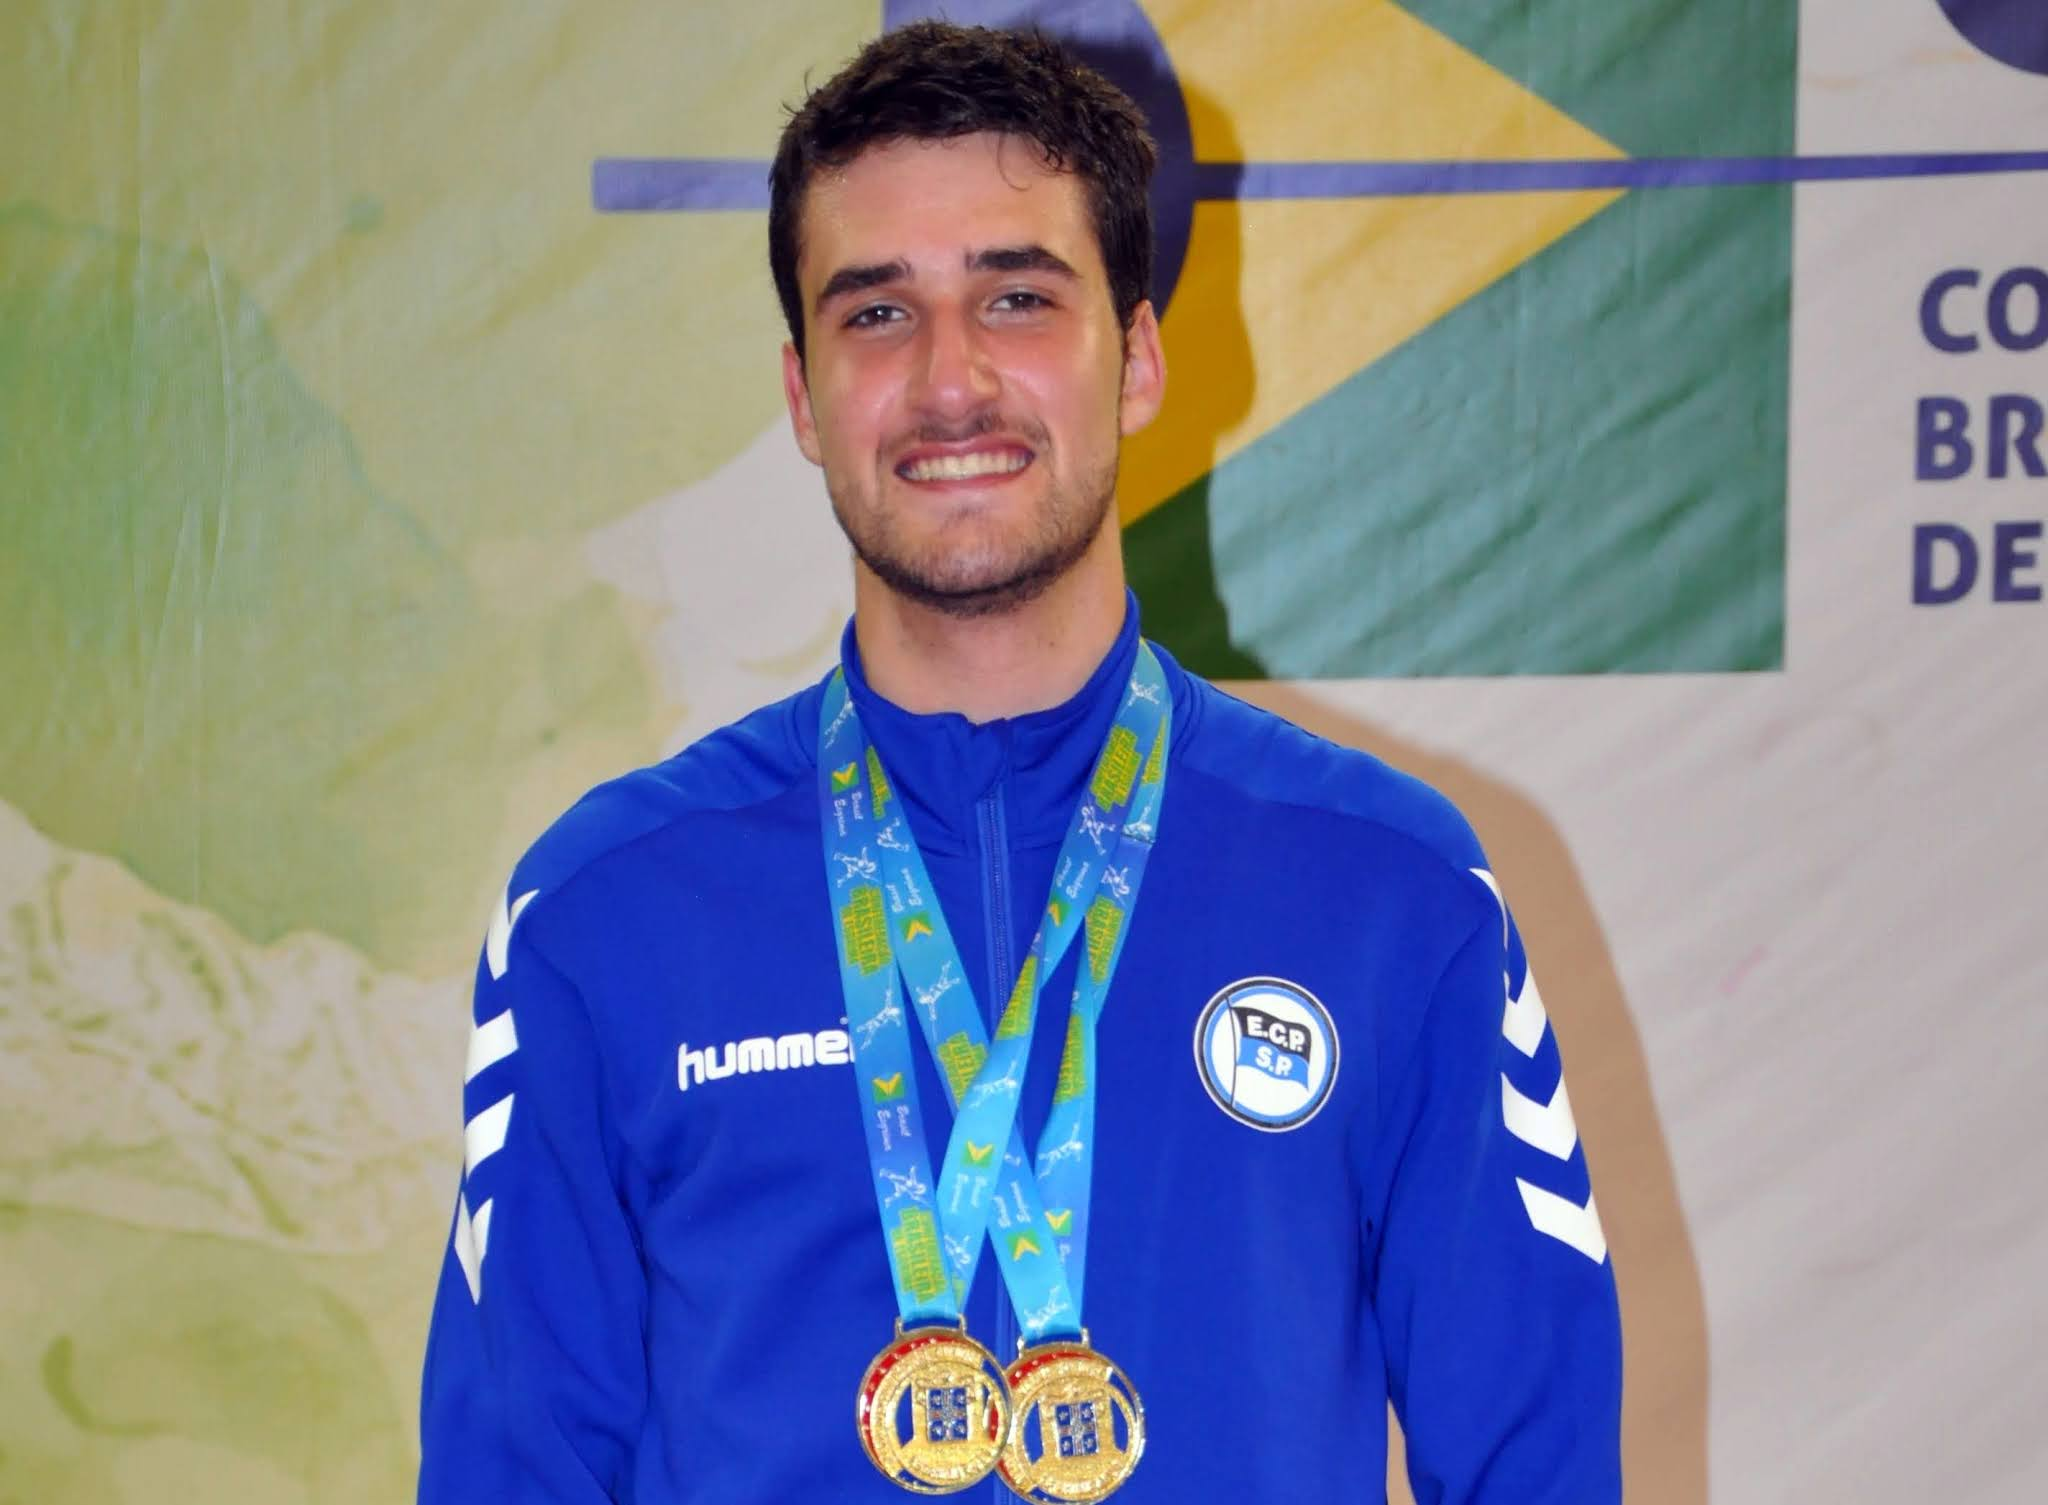 Bruno Pekelman brasil esgrima sabre